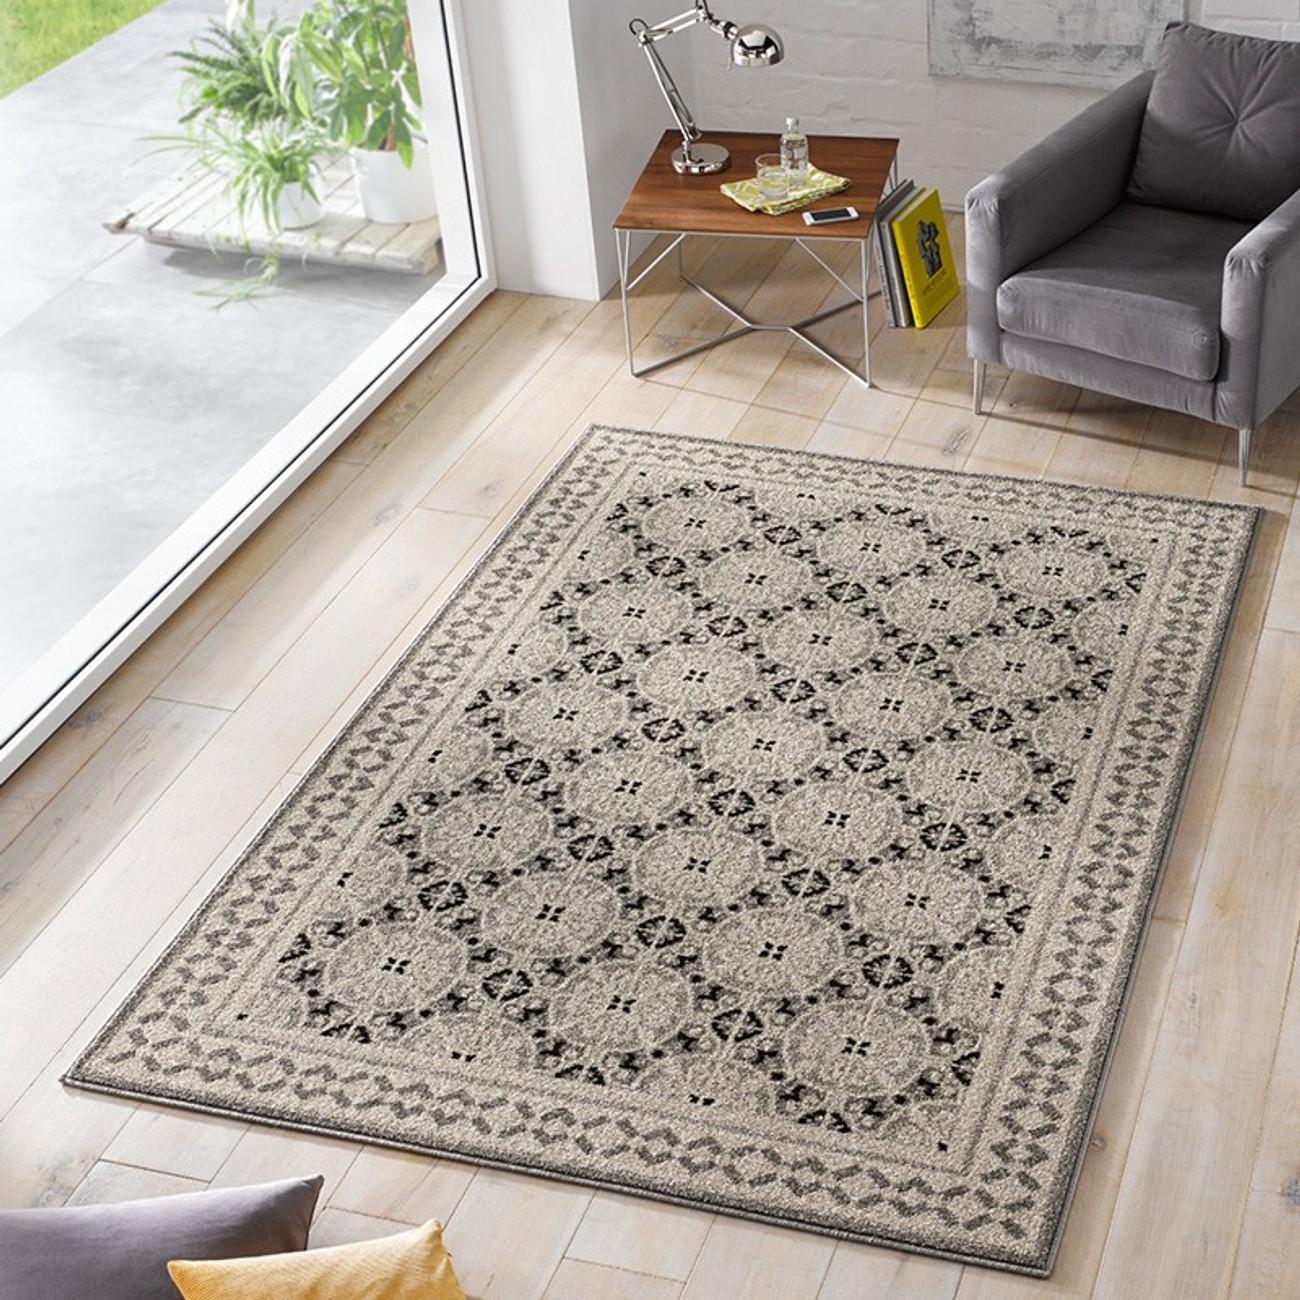 design velours teppich marble grau taupe schwarz teppiche. Black Bedroom Furniture Sets. Home Design Ideas